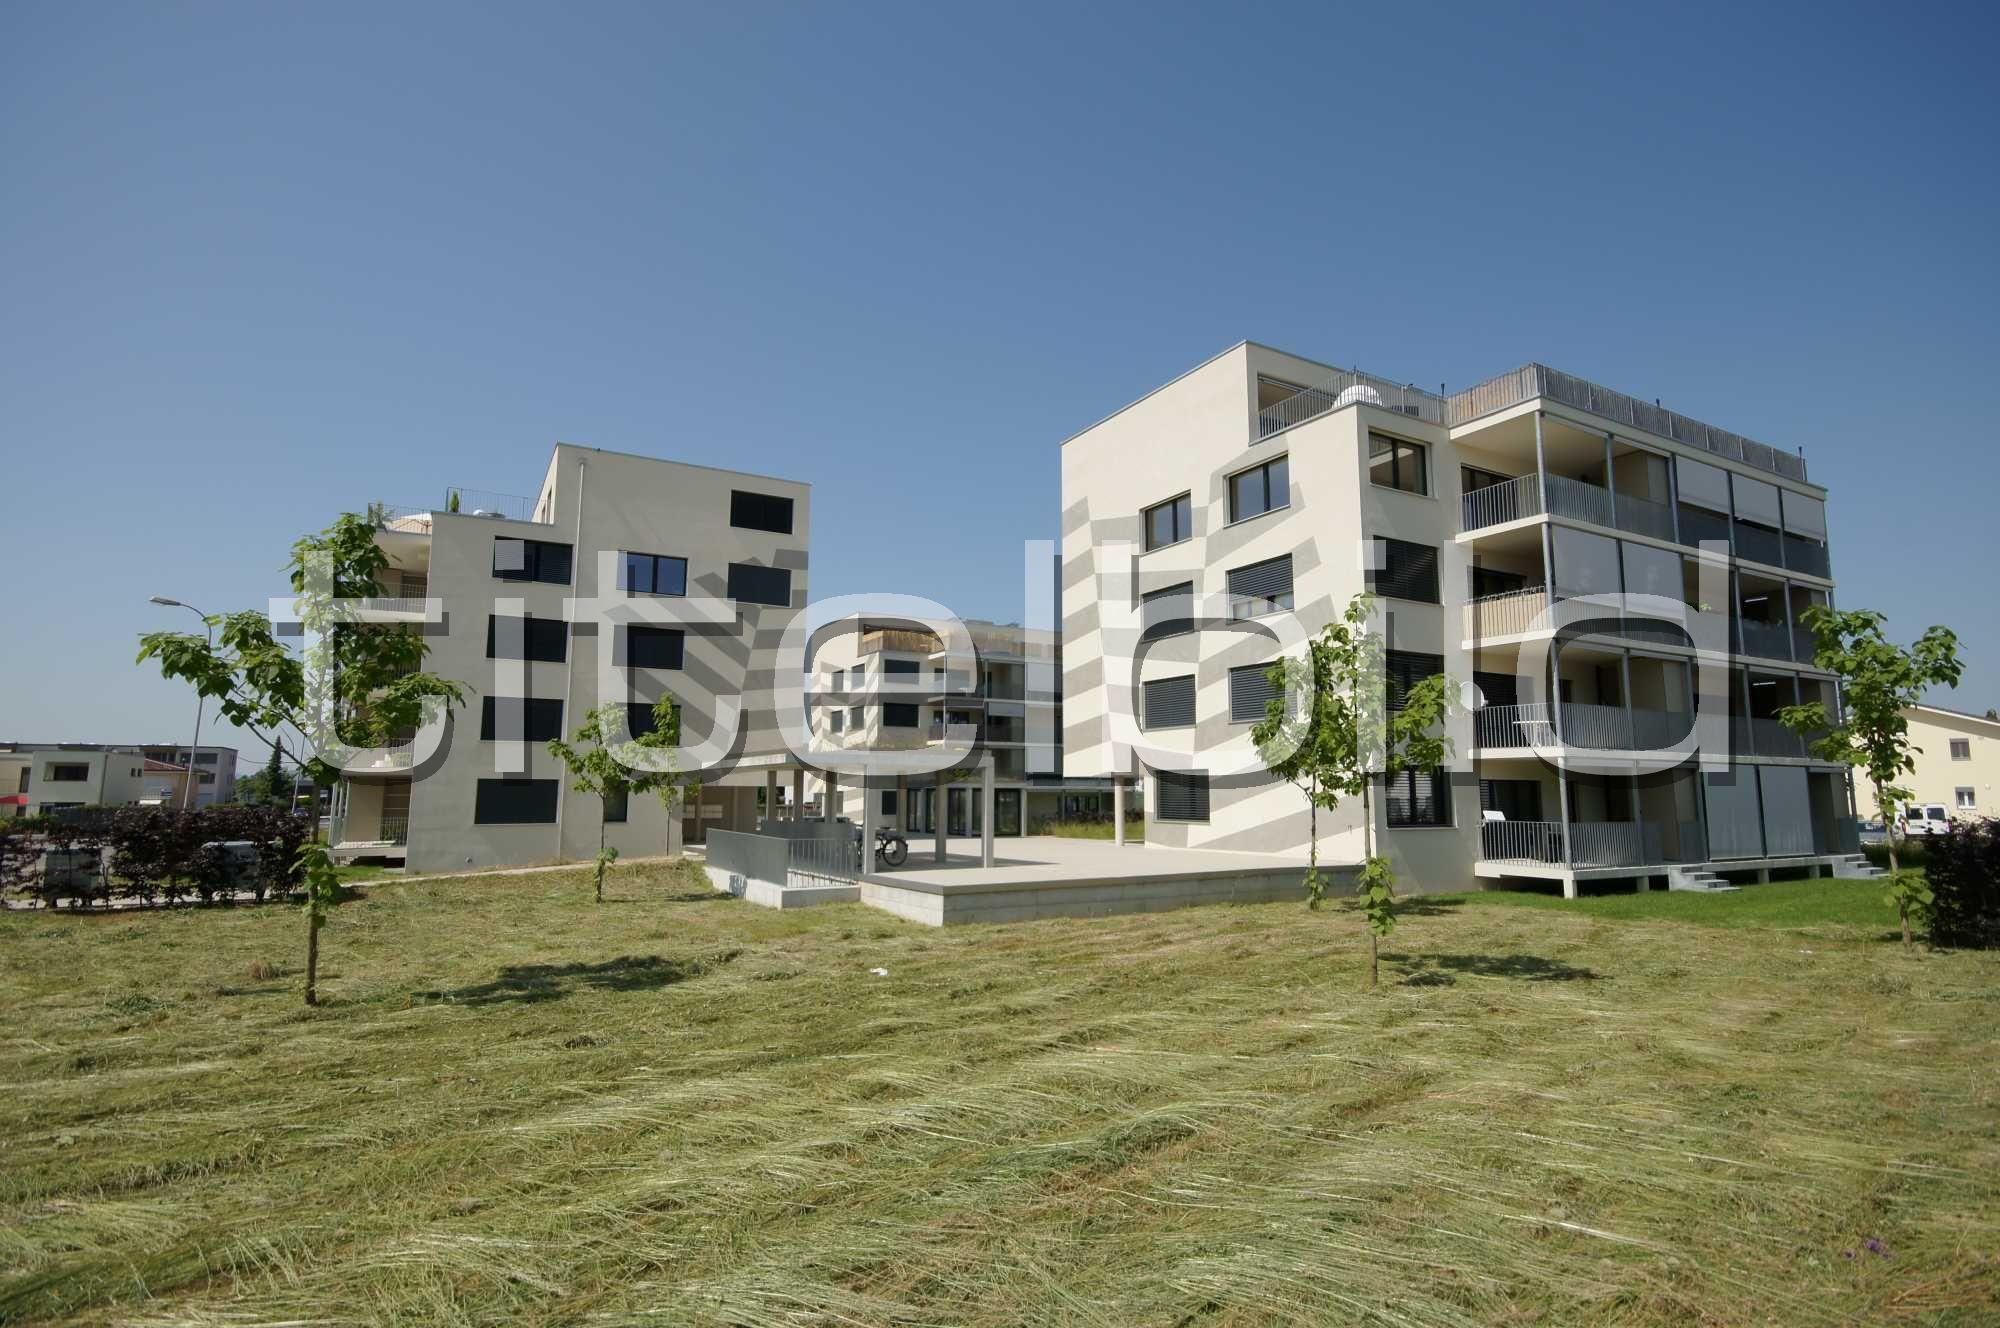 Projektbild-Nr. 5: Wohnüberbauung Dockland